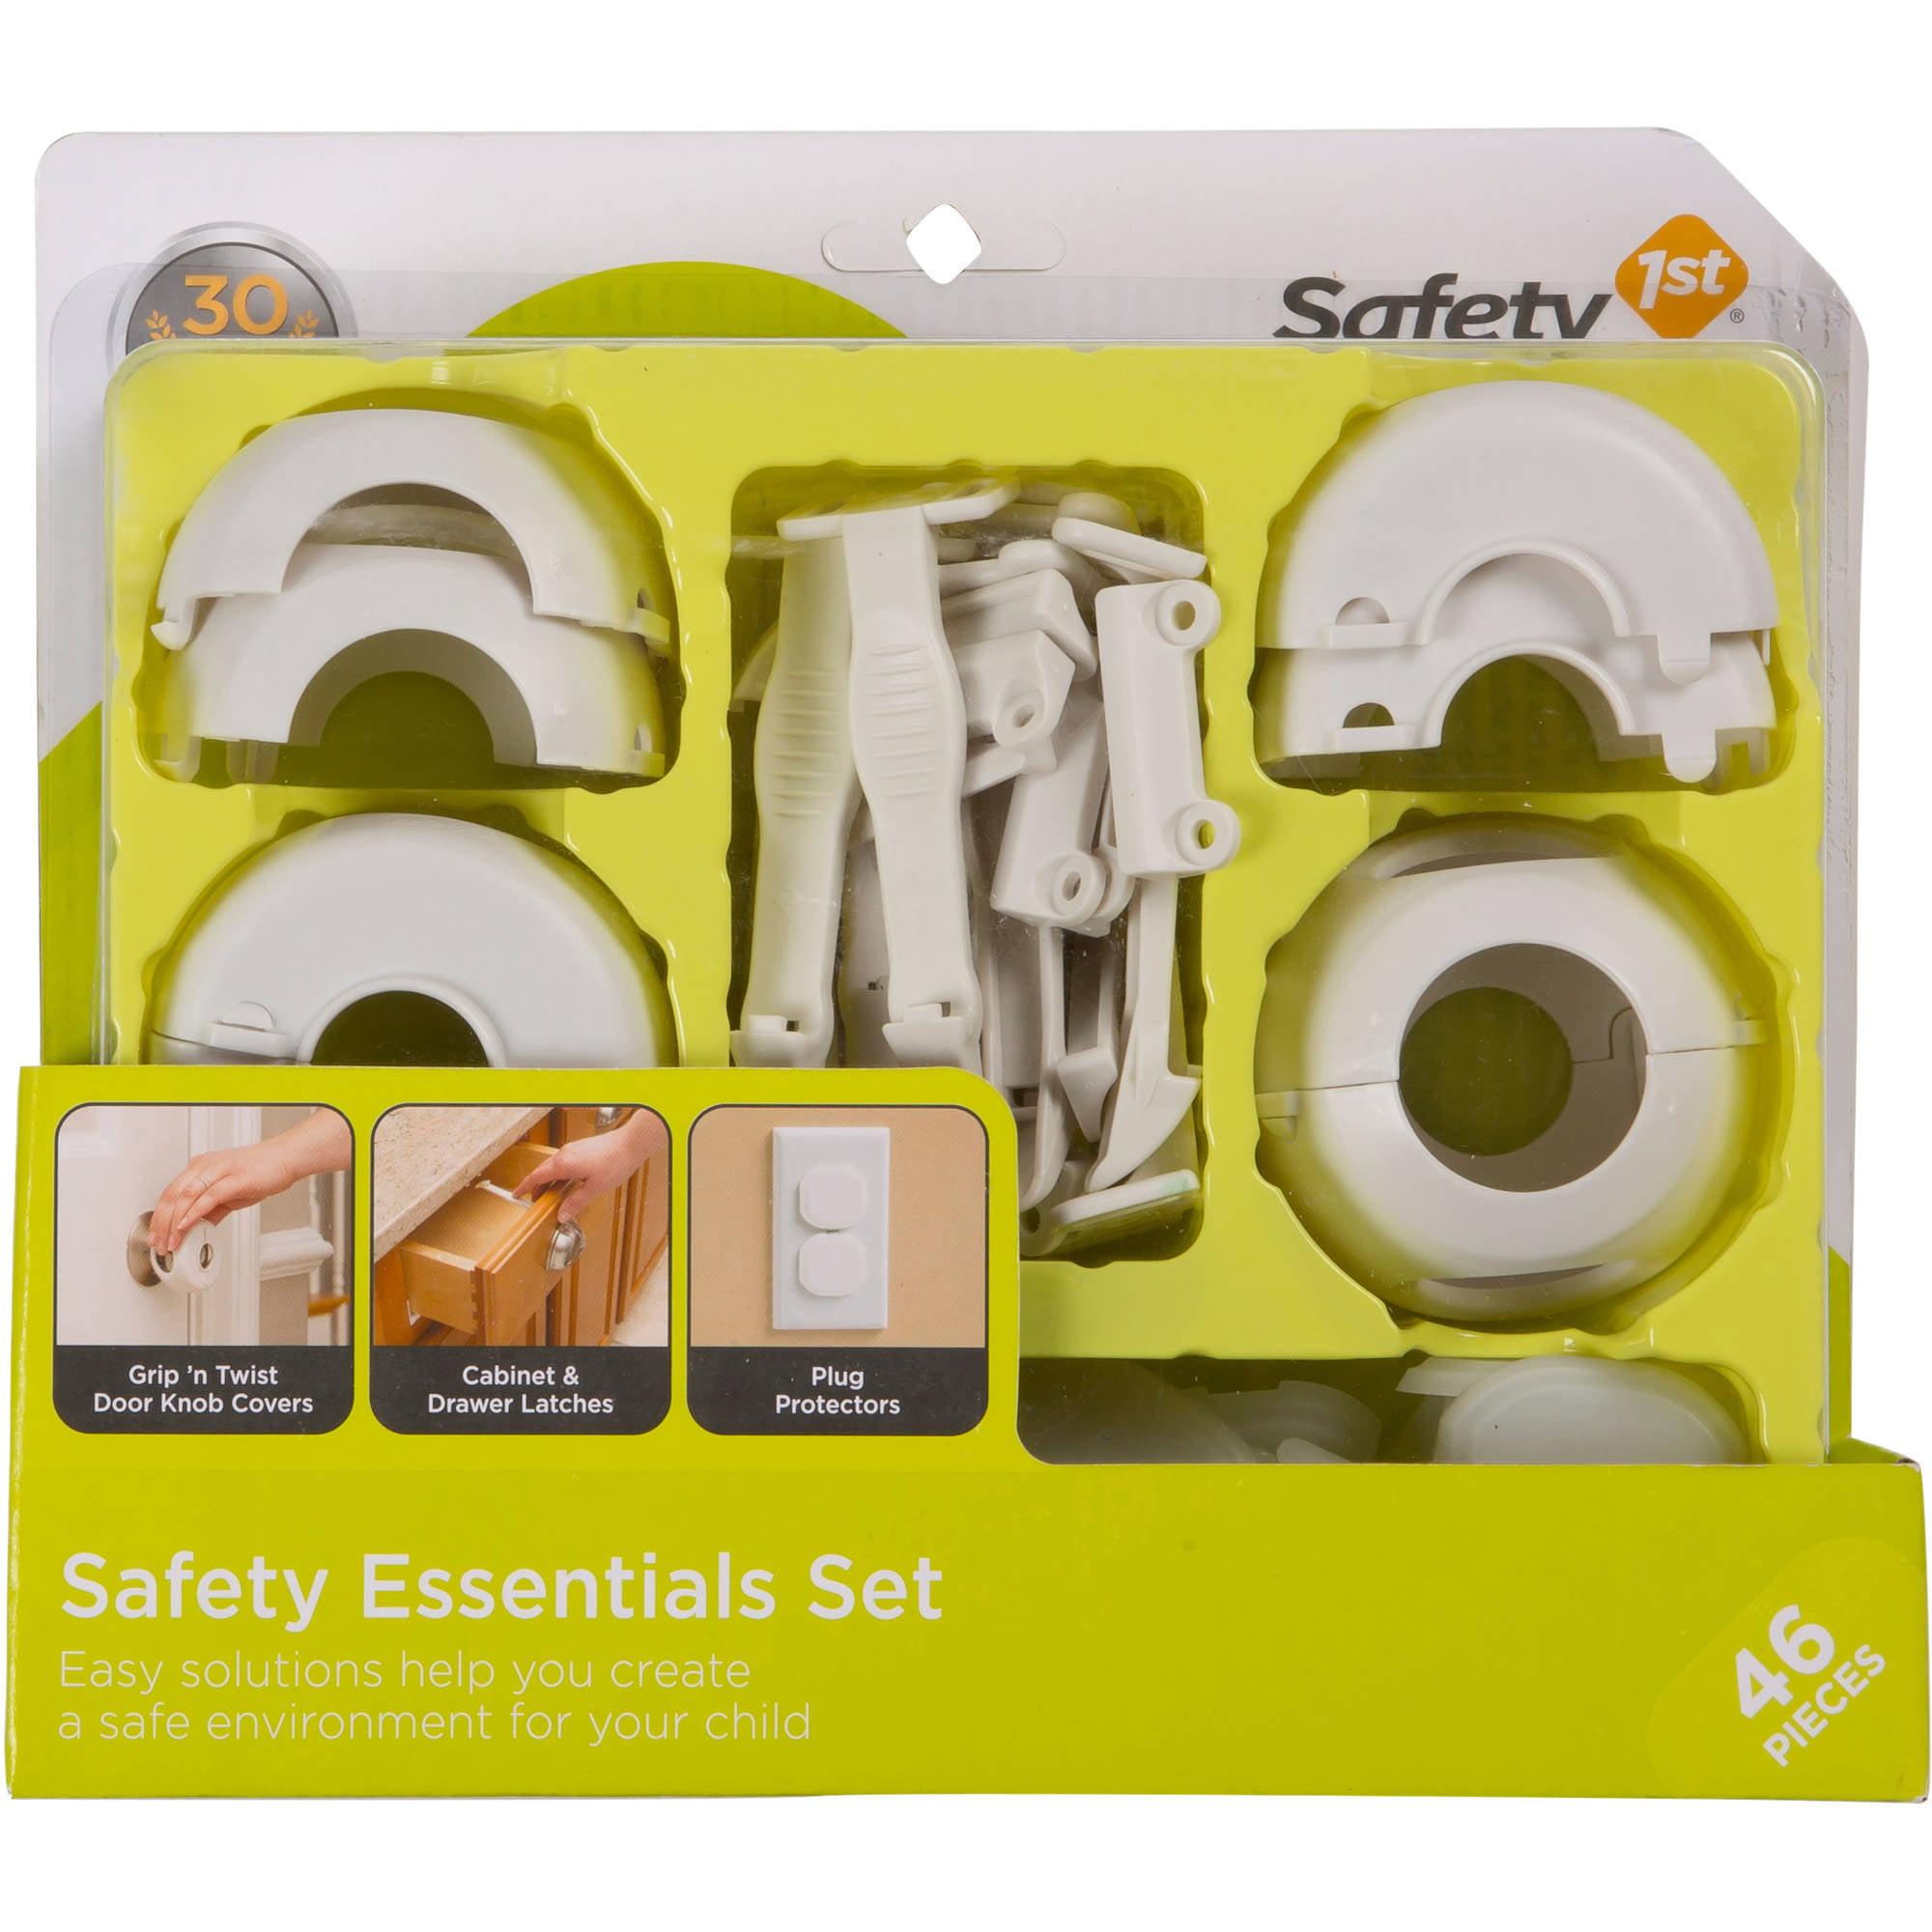 Safety 1st Safety Essentials Kit, 46 Pieces